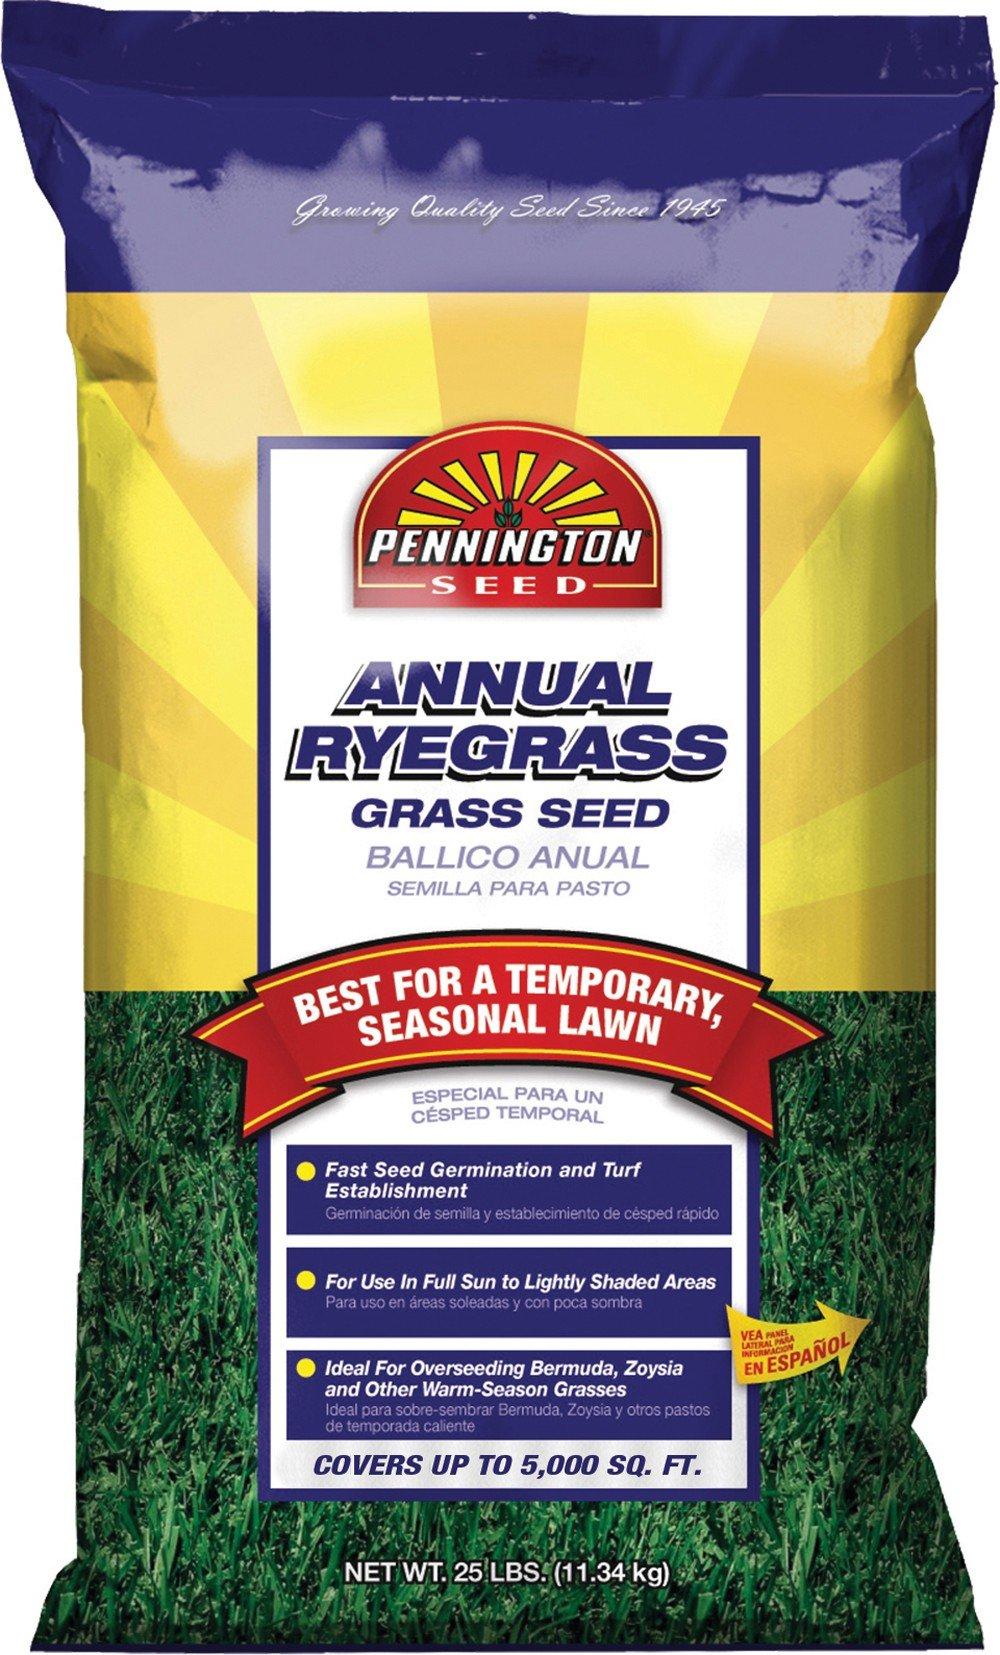 Pennington Annual Ryegrass Retail Bag to Overseed Warm Season Grasses, 25 lb